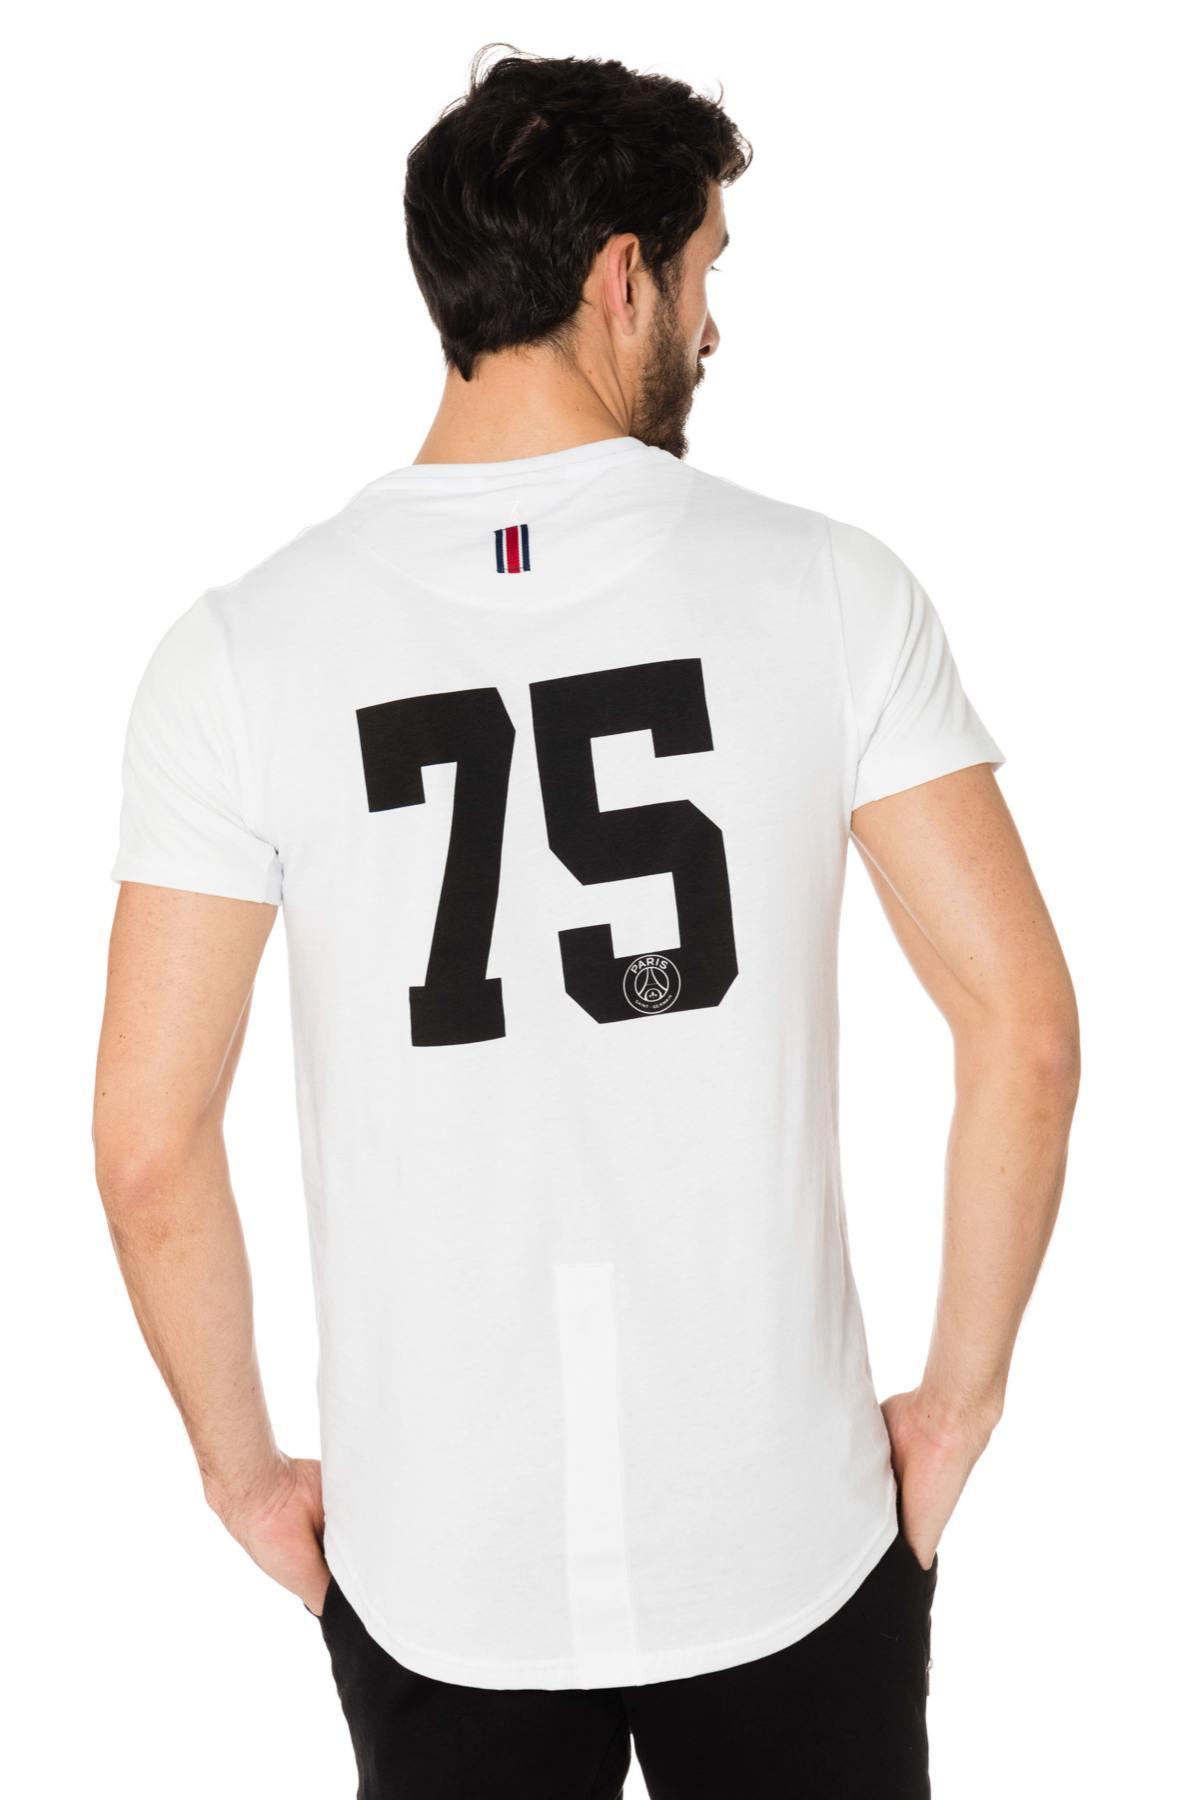 la marque officielle du psg t shirts neymar jogging. Black Bedroom Furniture Sets. Home Design Ideas